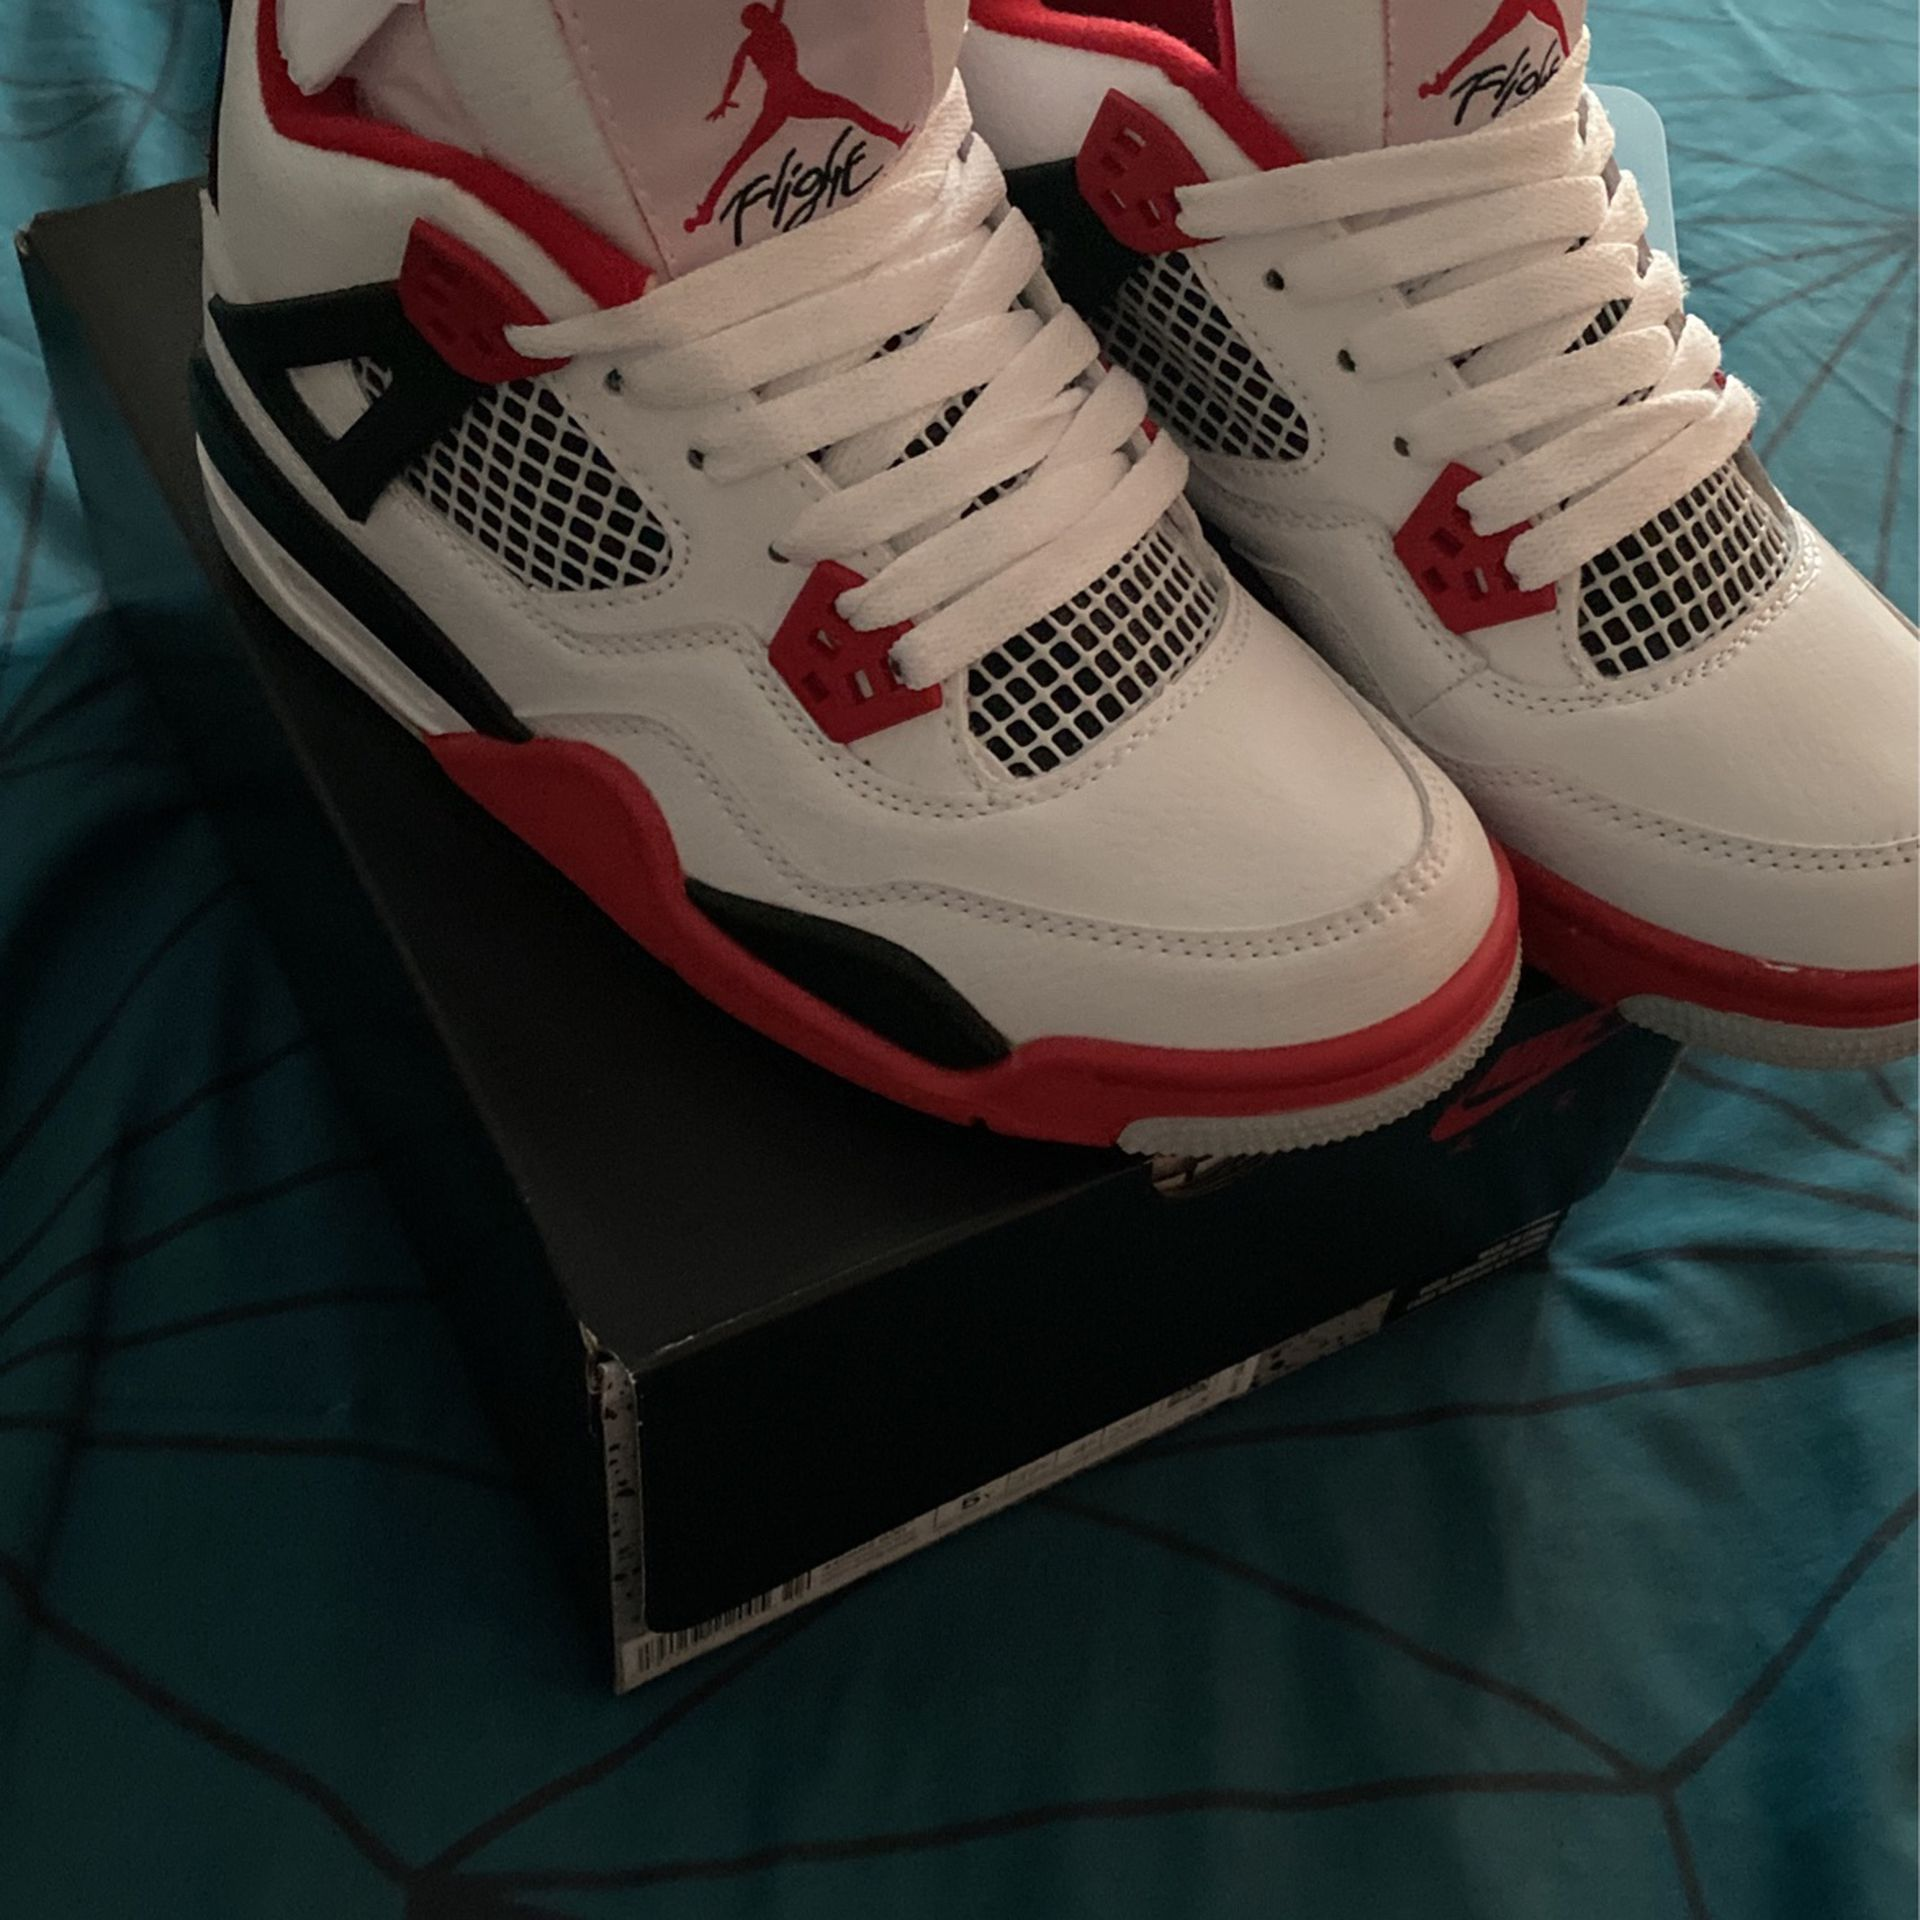 Jordan 4 White & Red